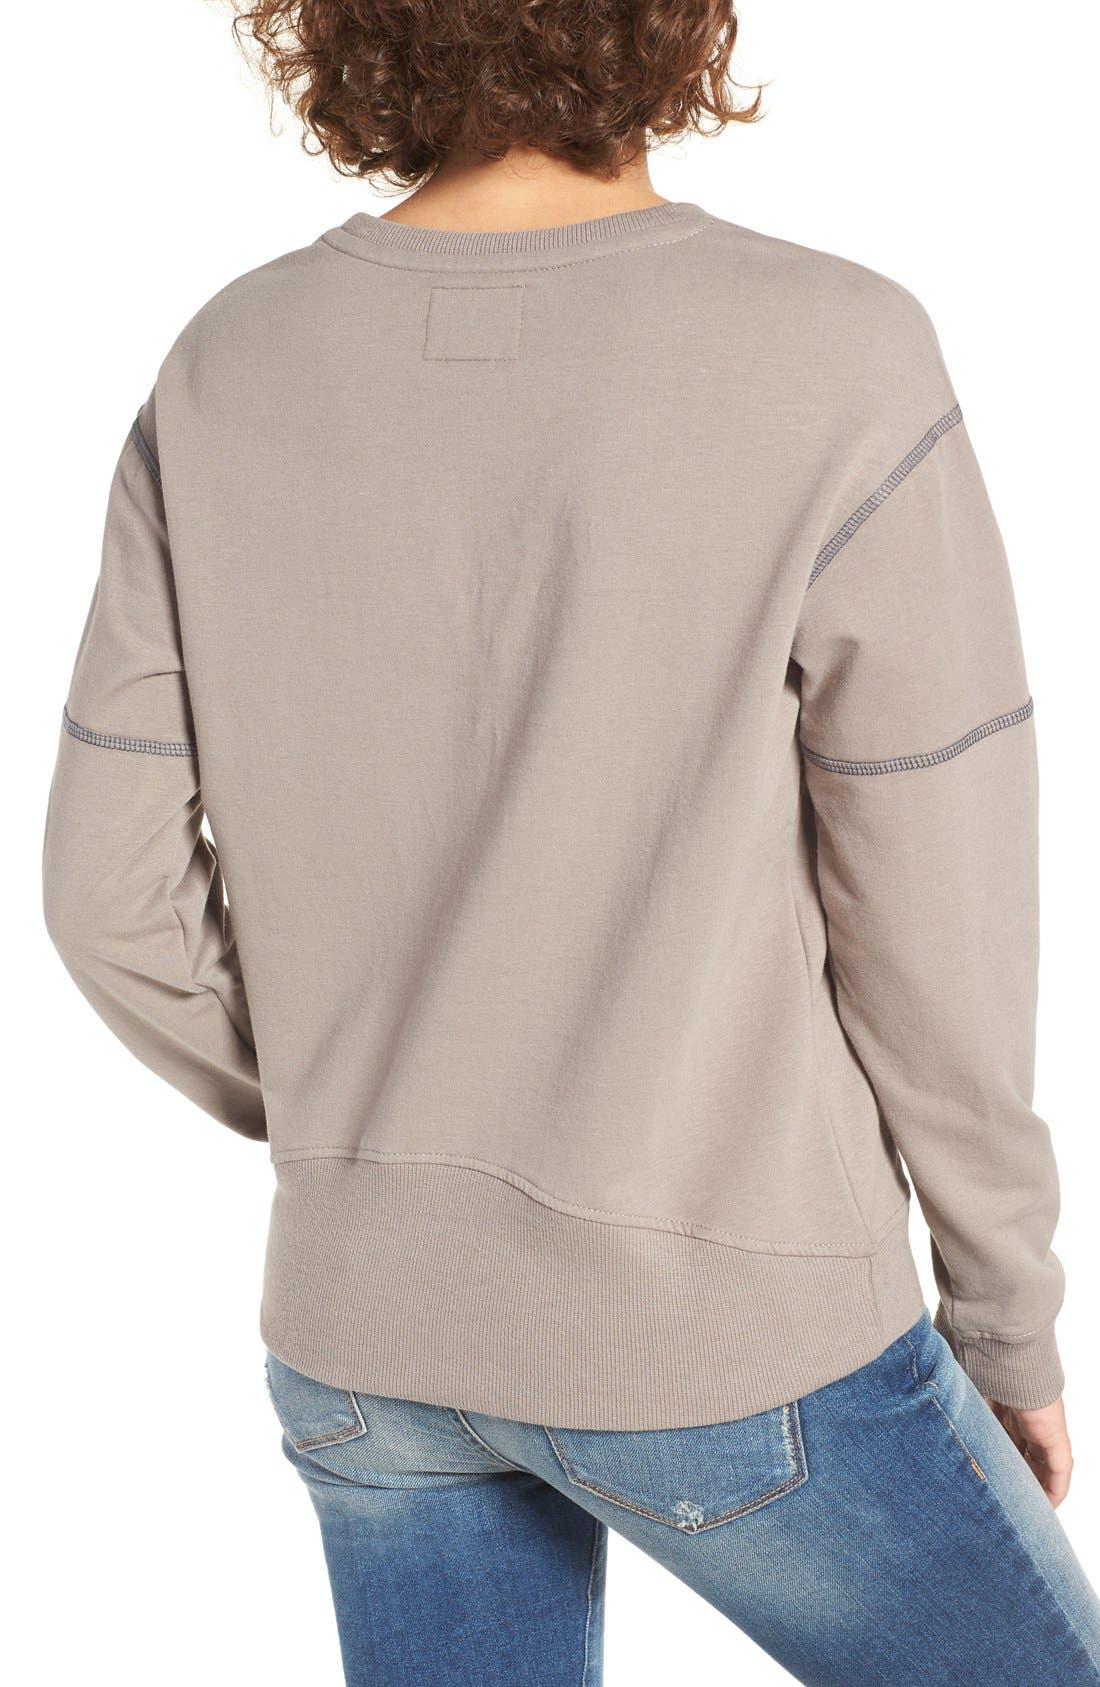 Alternate Image 2  - '47 'Seattle Seahawks' Graphic Sweatshirt